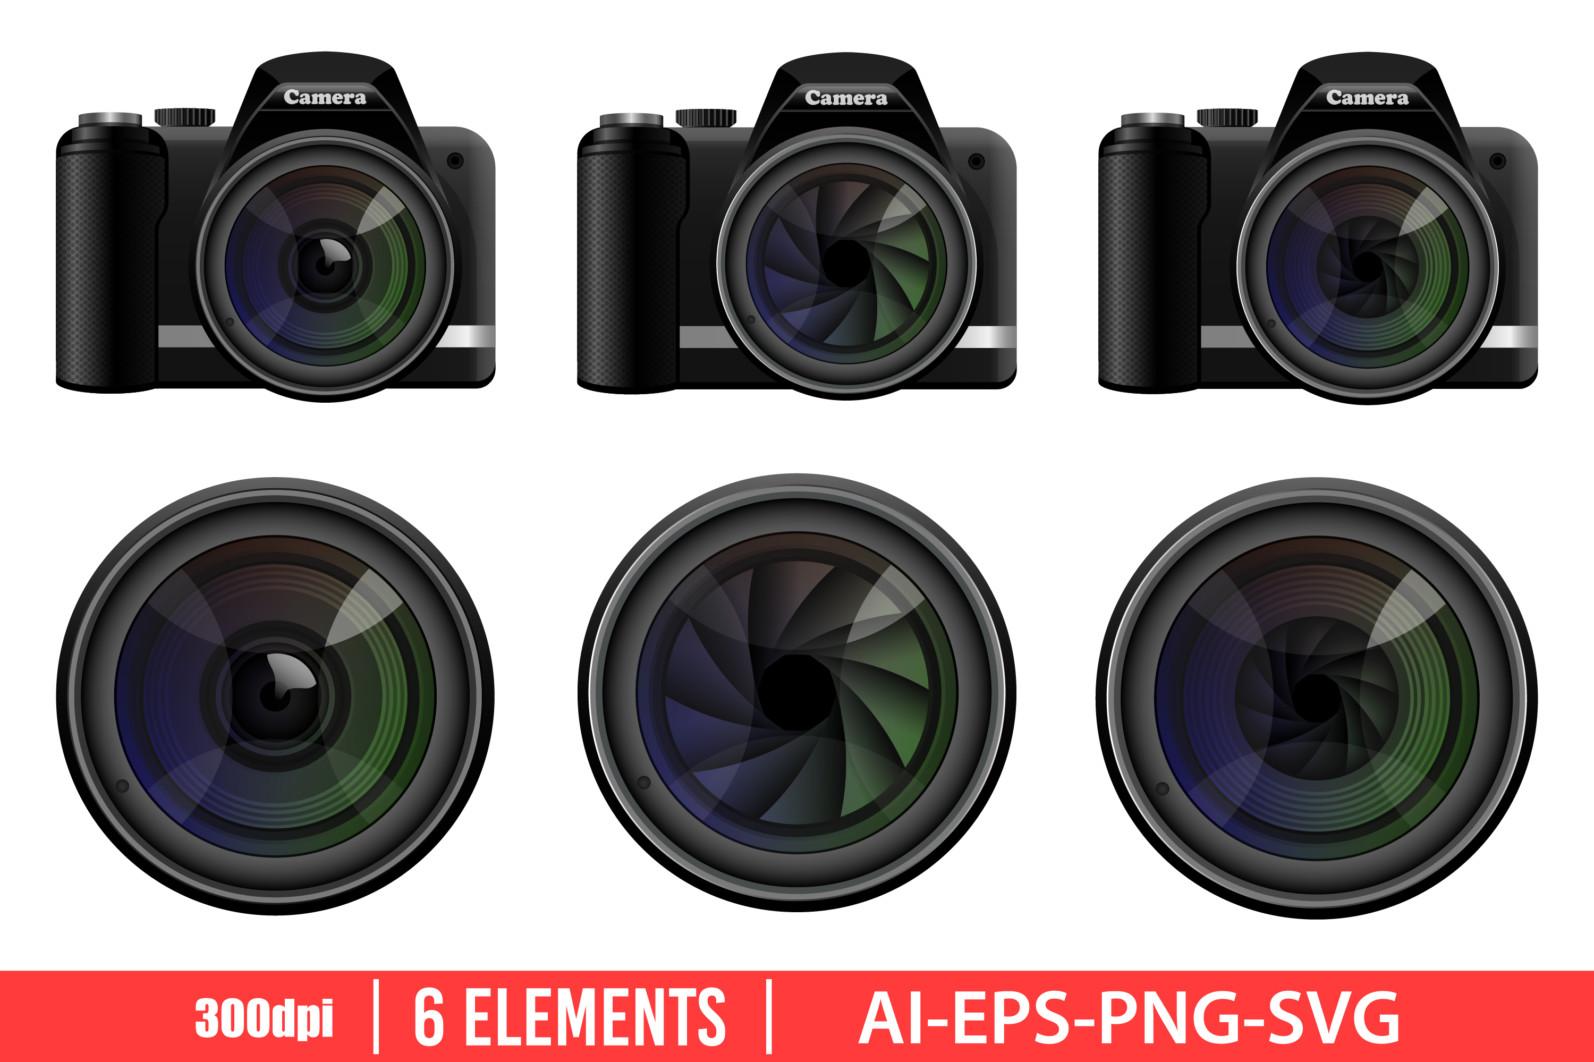 Dslr photo camera clipart vector design illustration. Dslr camera set. Vector Clipart Print - DSLR CAMERA scaled -